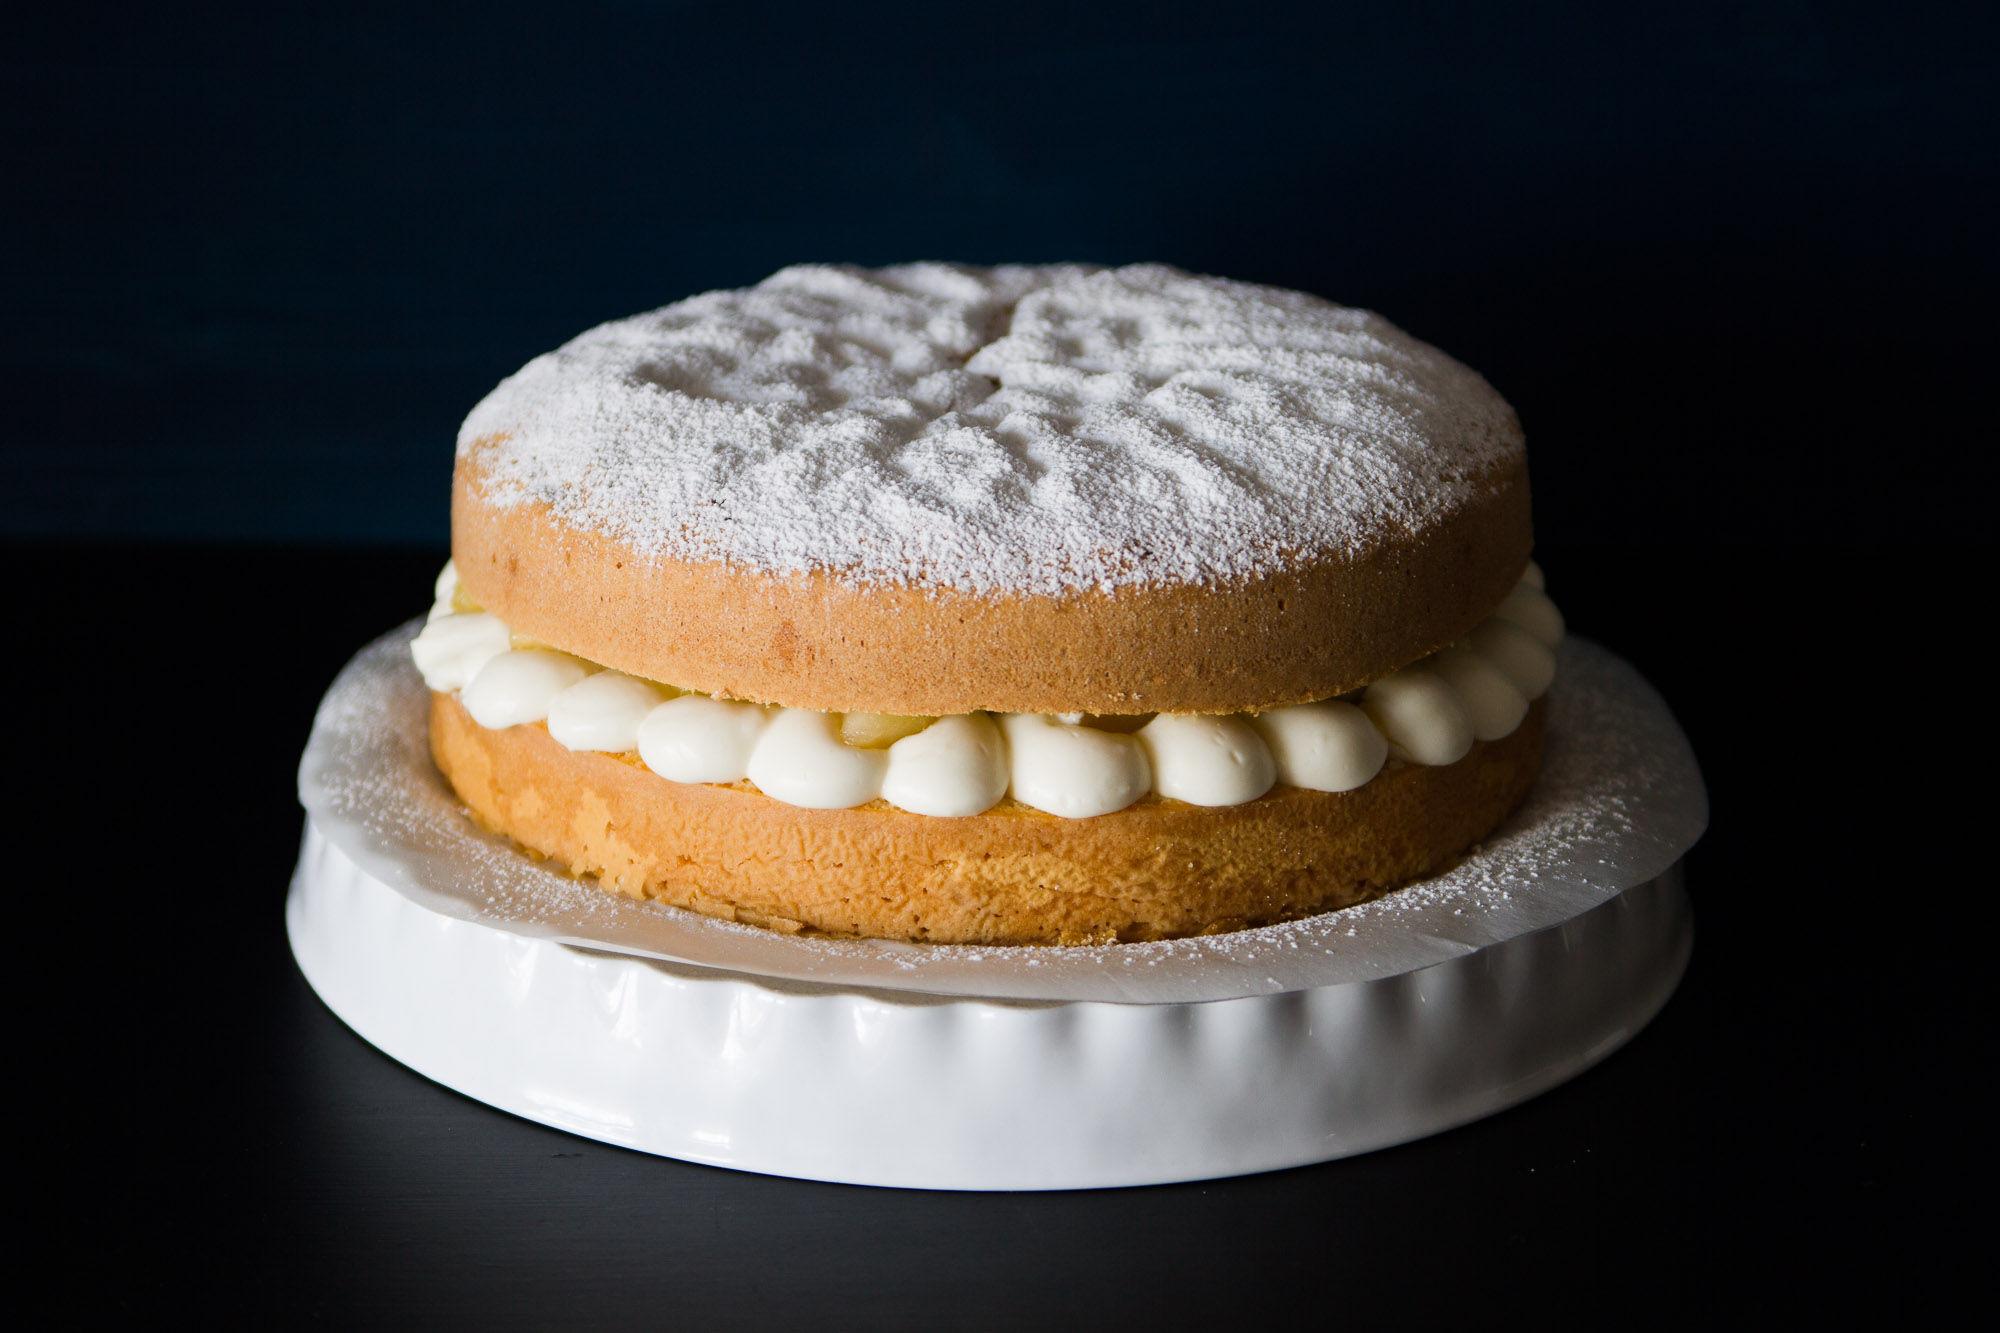 torta_mele_latte_miele_02